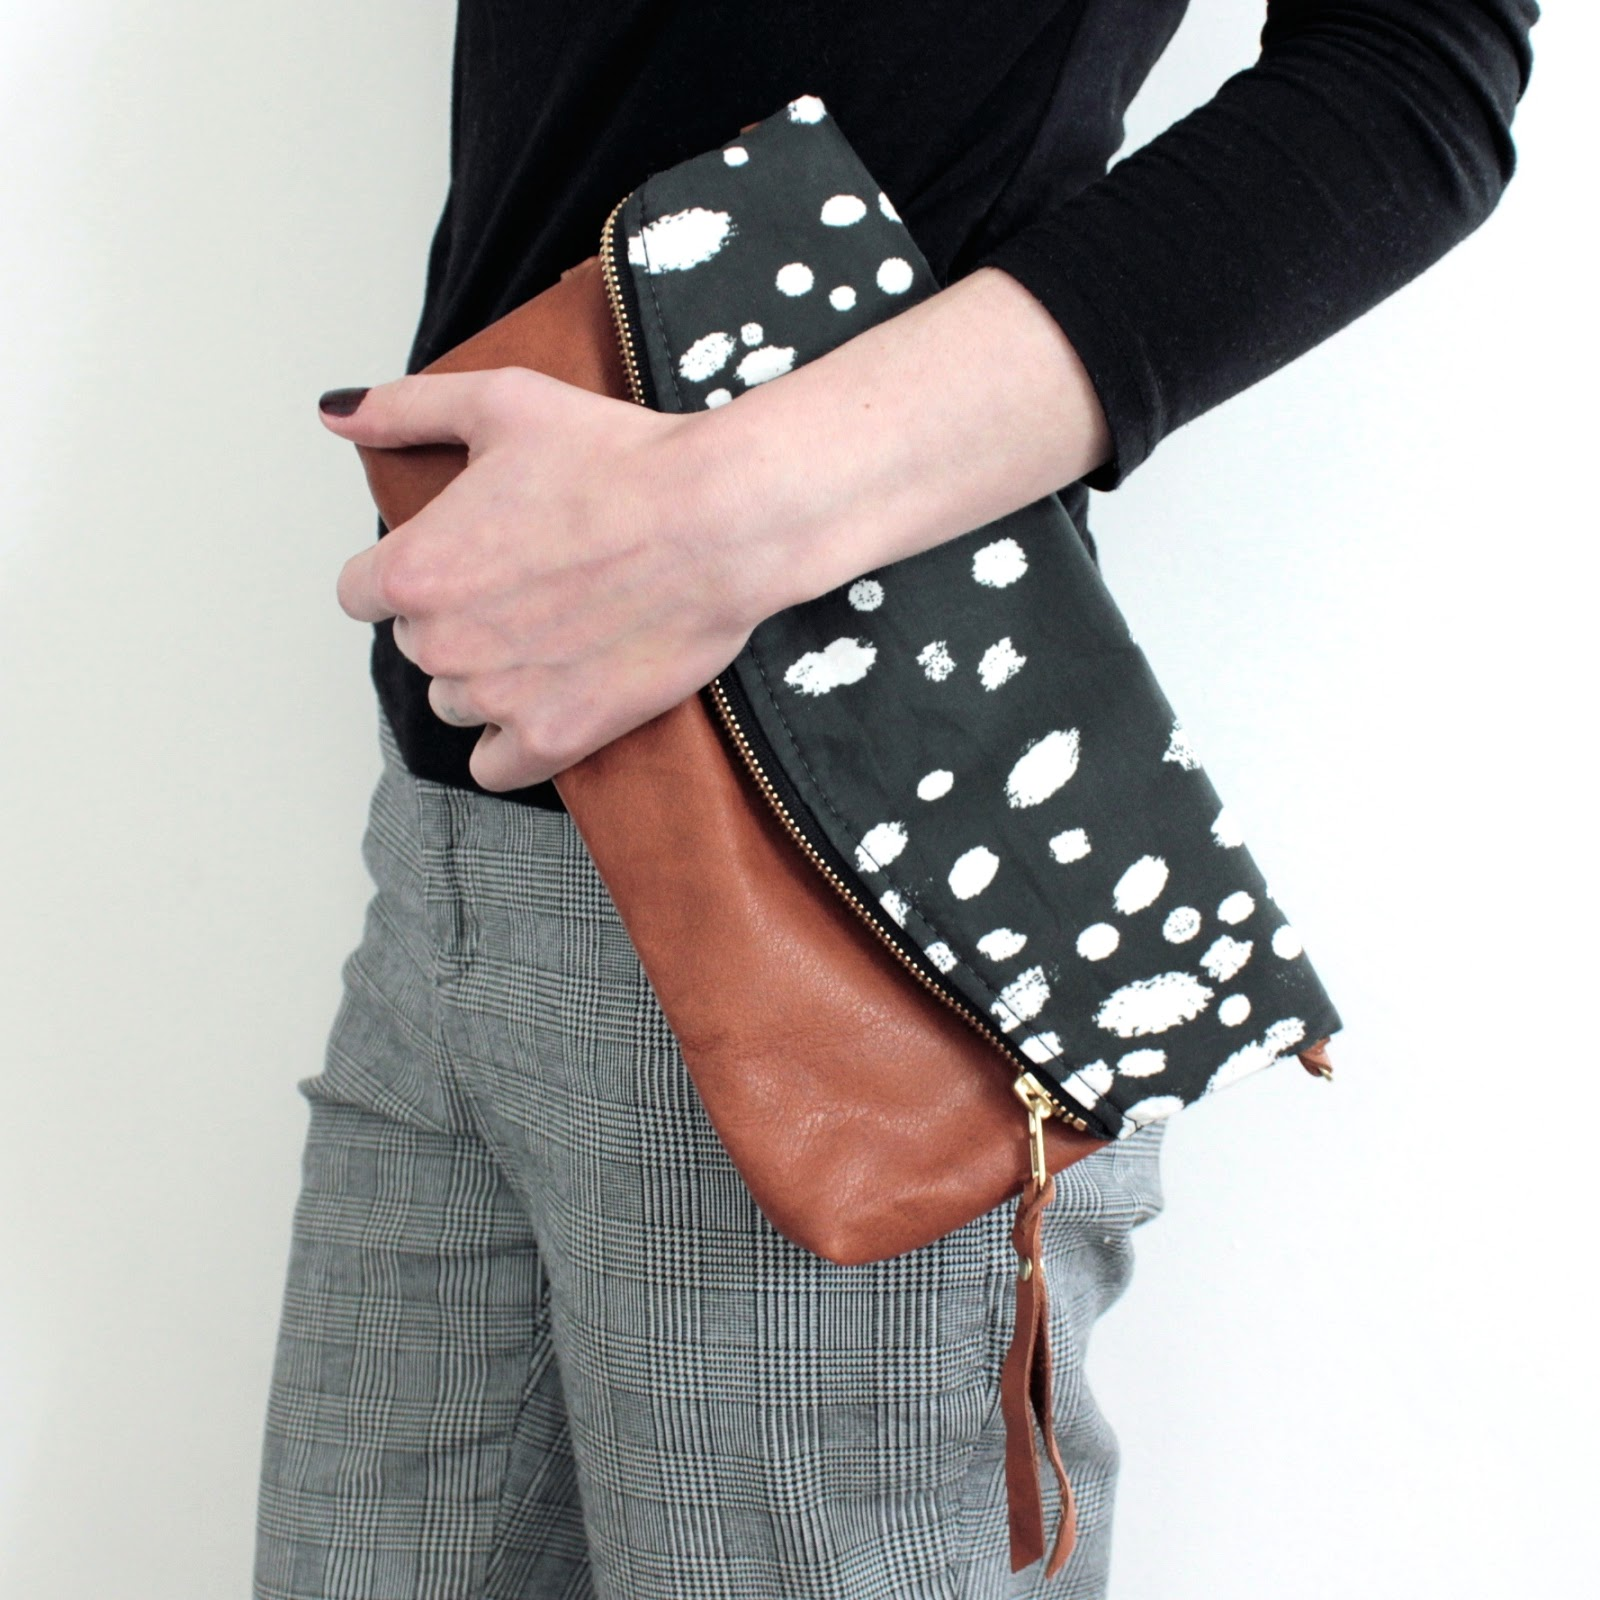 Antelope Shop Anneb designs Aspen Folded Clutch Citrine Lining Boheme Leather bag antelopeshop.com Lexie Blush